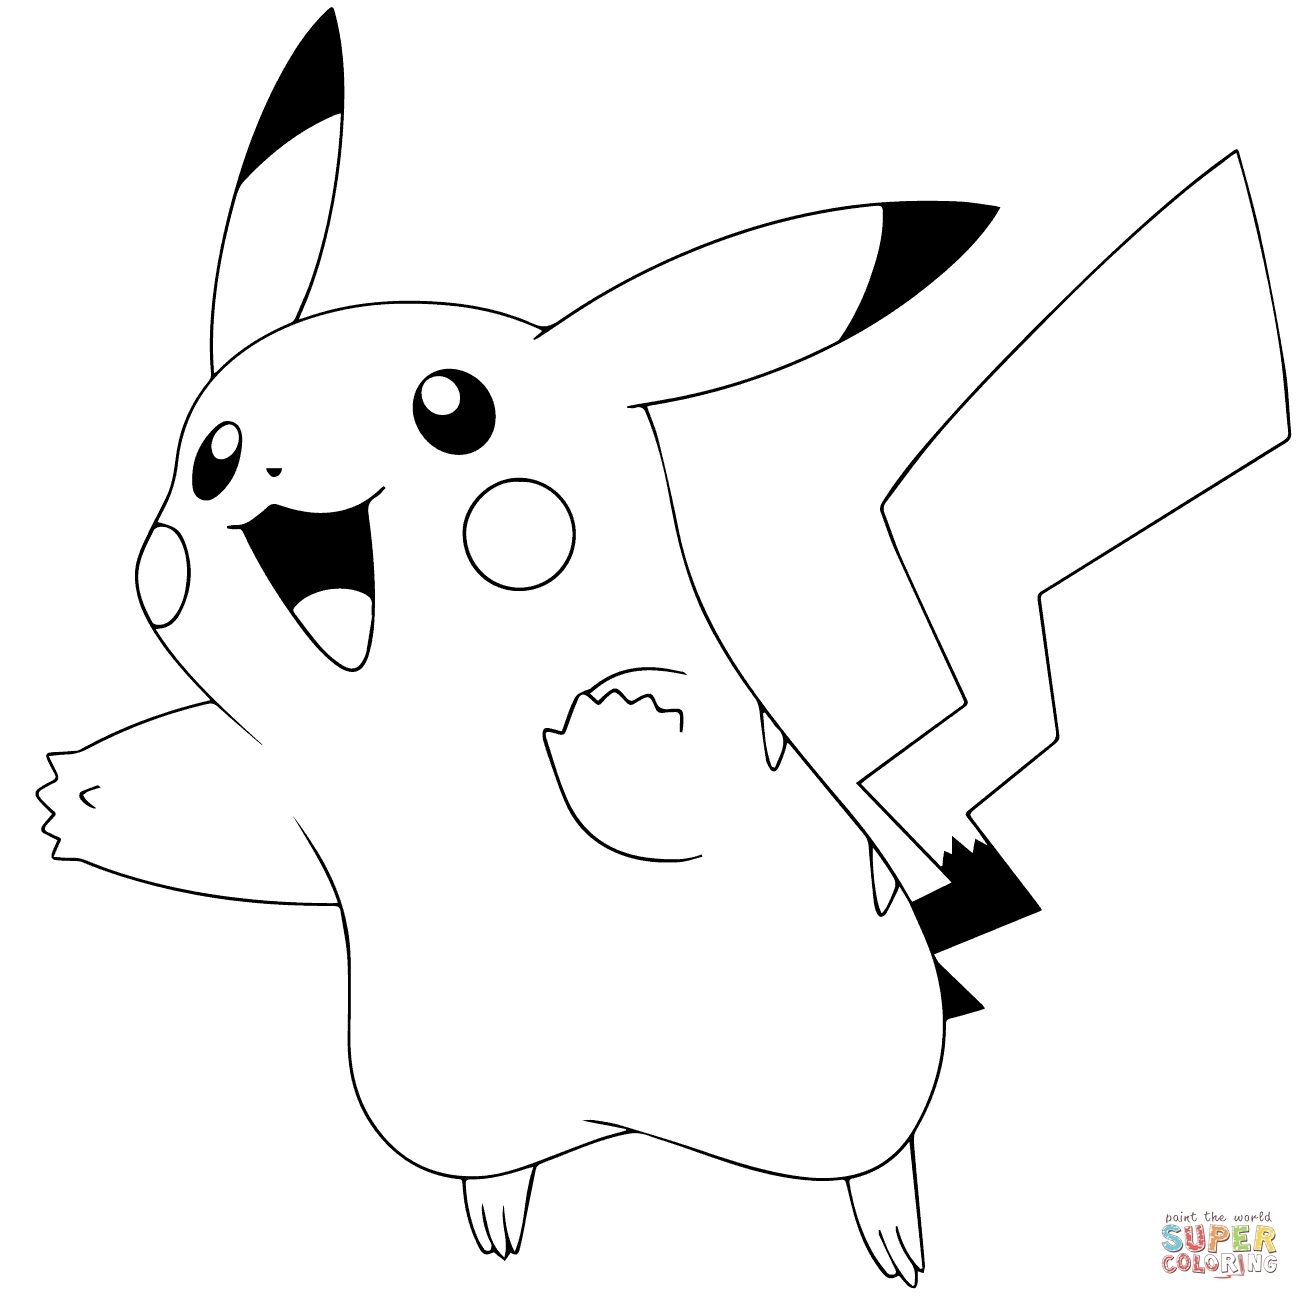 1300x1300 Pikachu Clipart Black And White